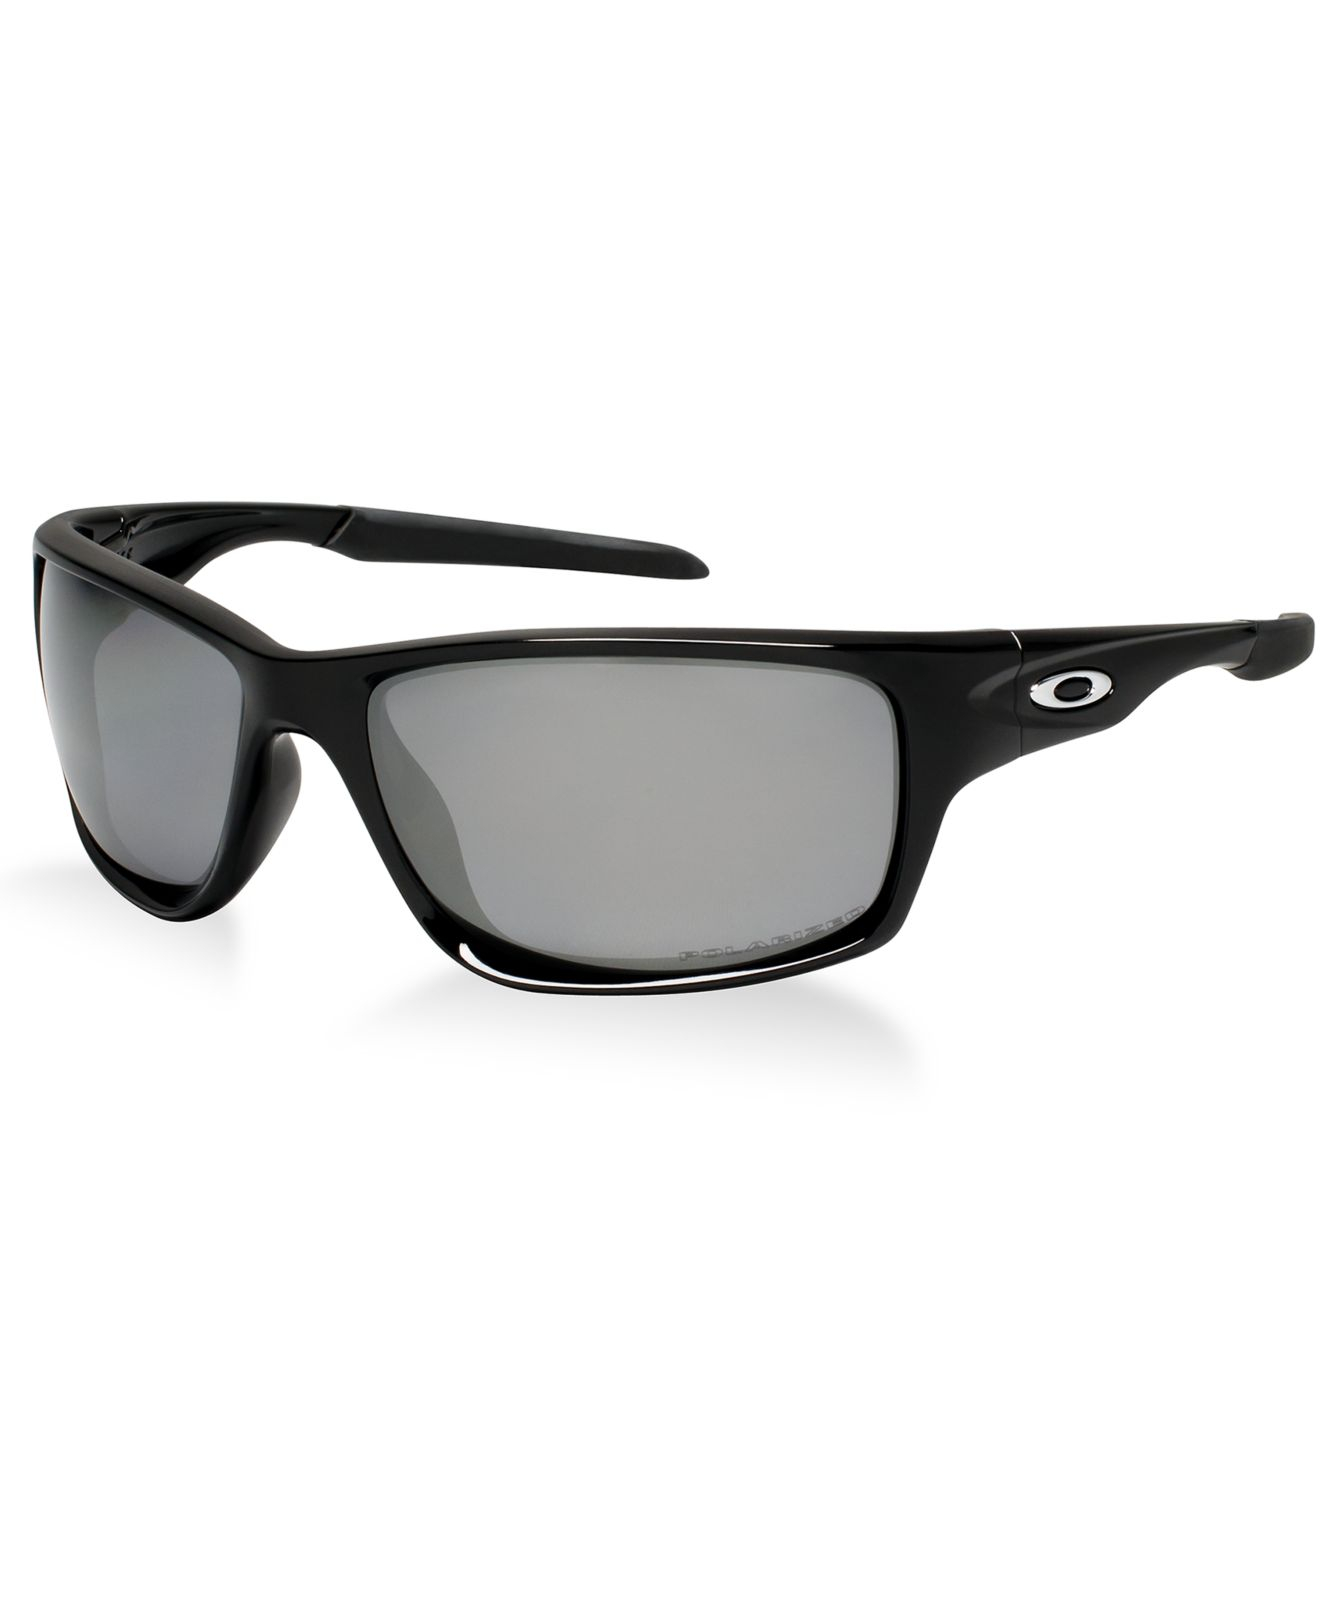 Oakley Canteen Sunglasses Polarized